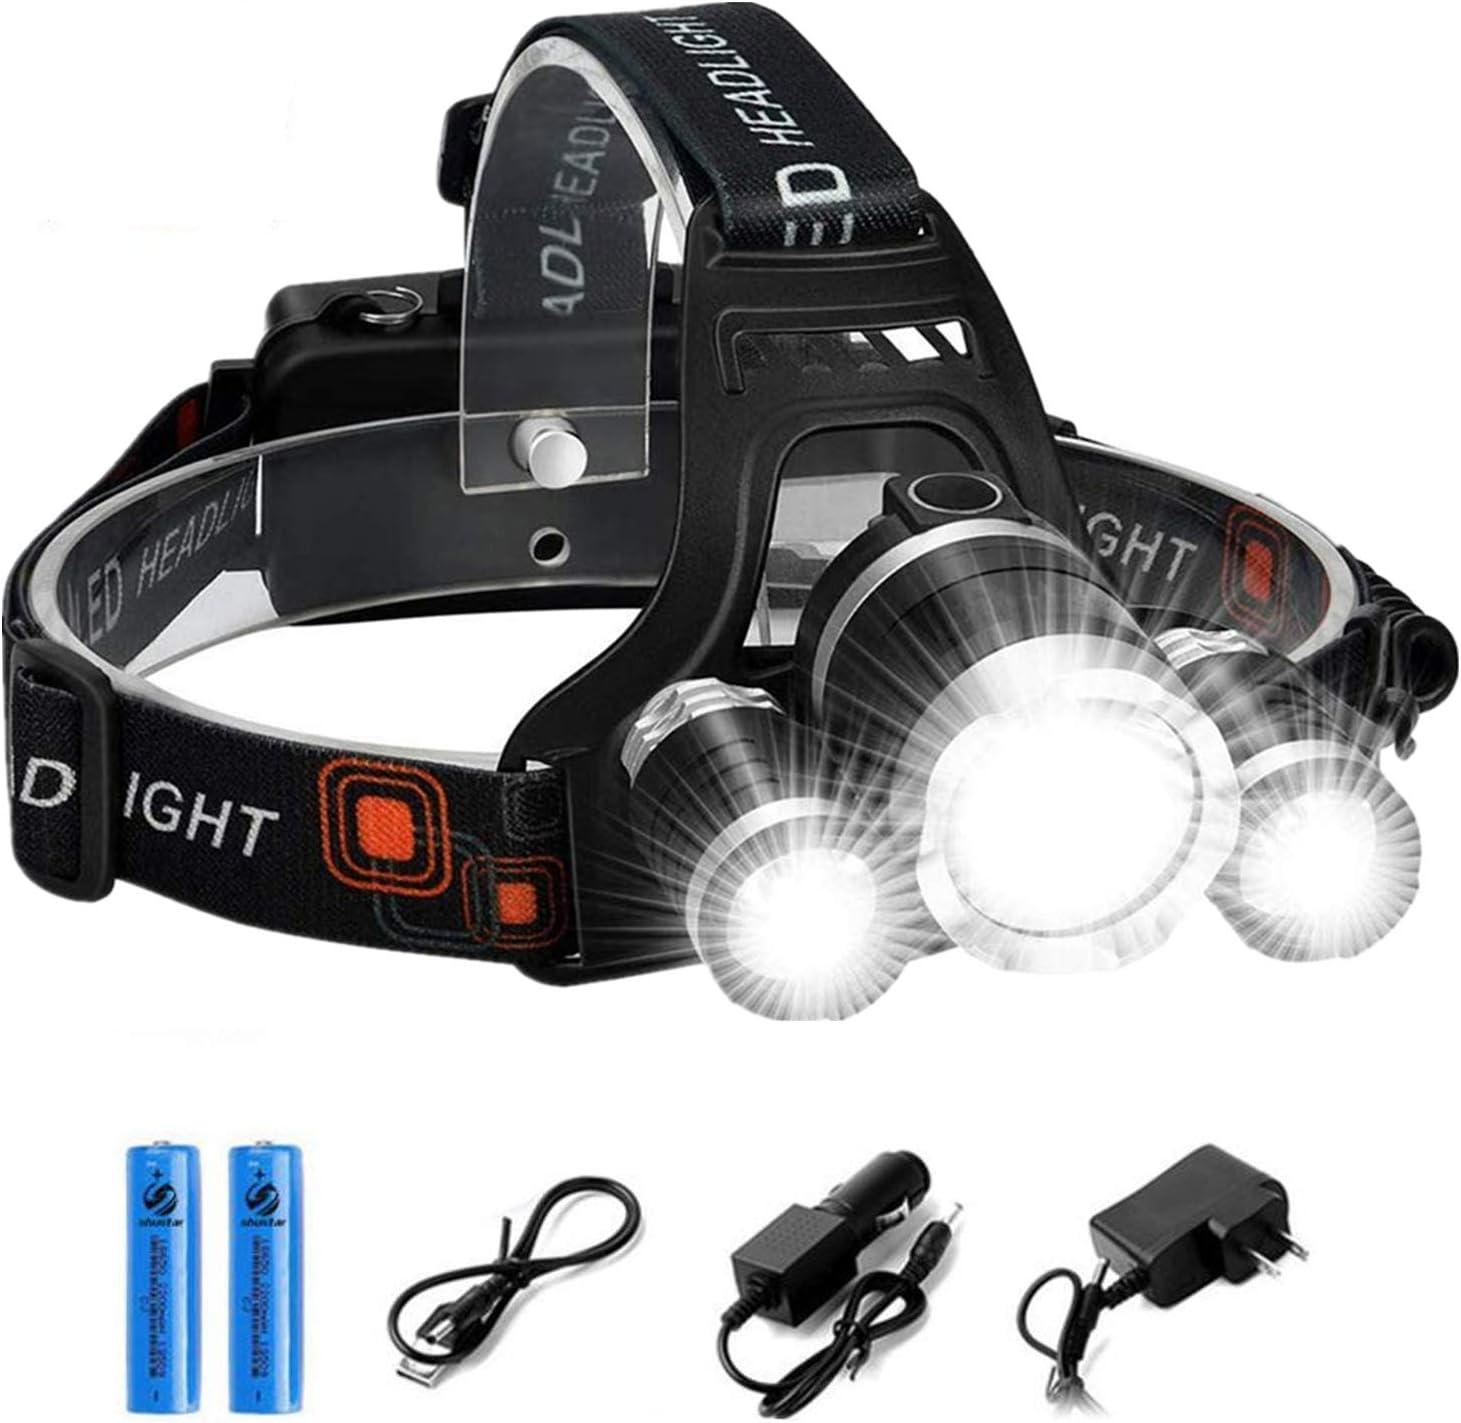 350000 Lumens LED Headlamp USB Rechargeable Headlamp Telescopic Zoomable EG